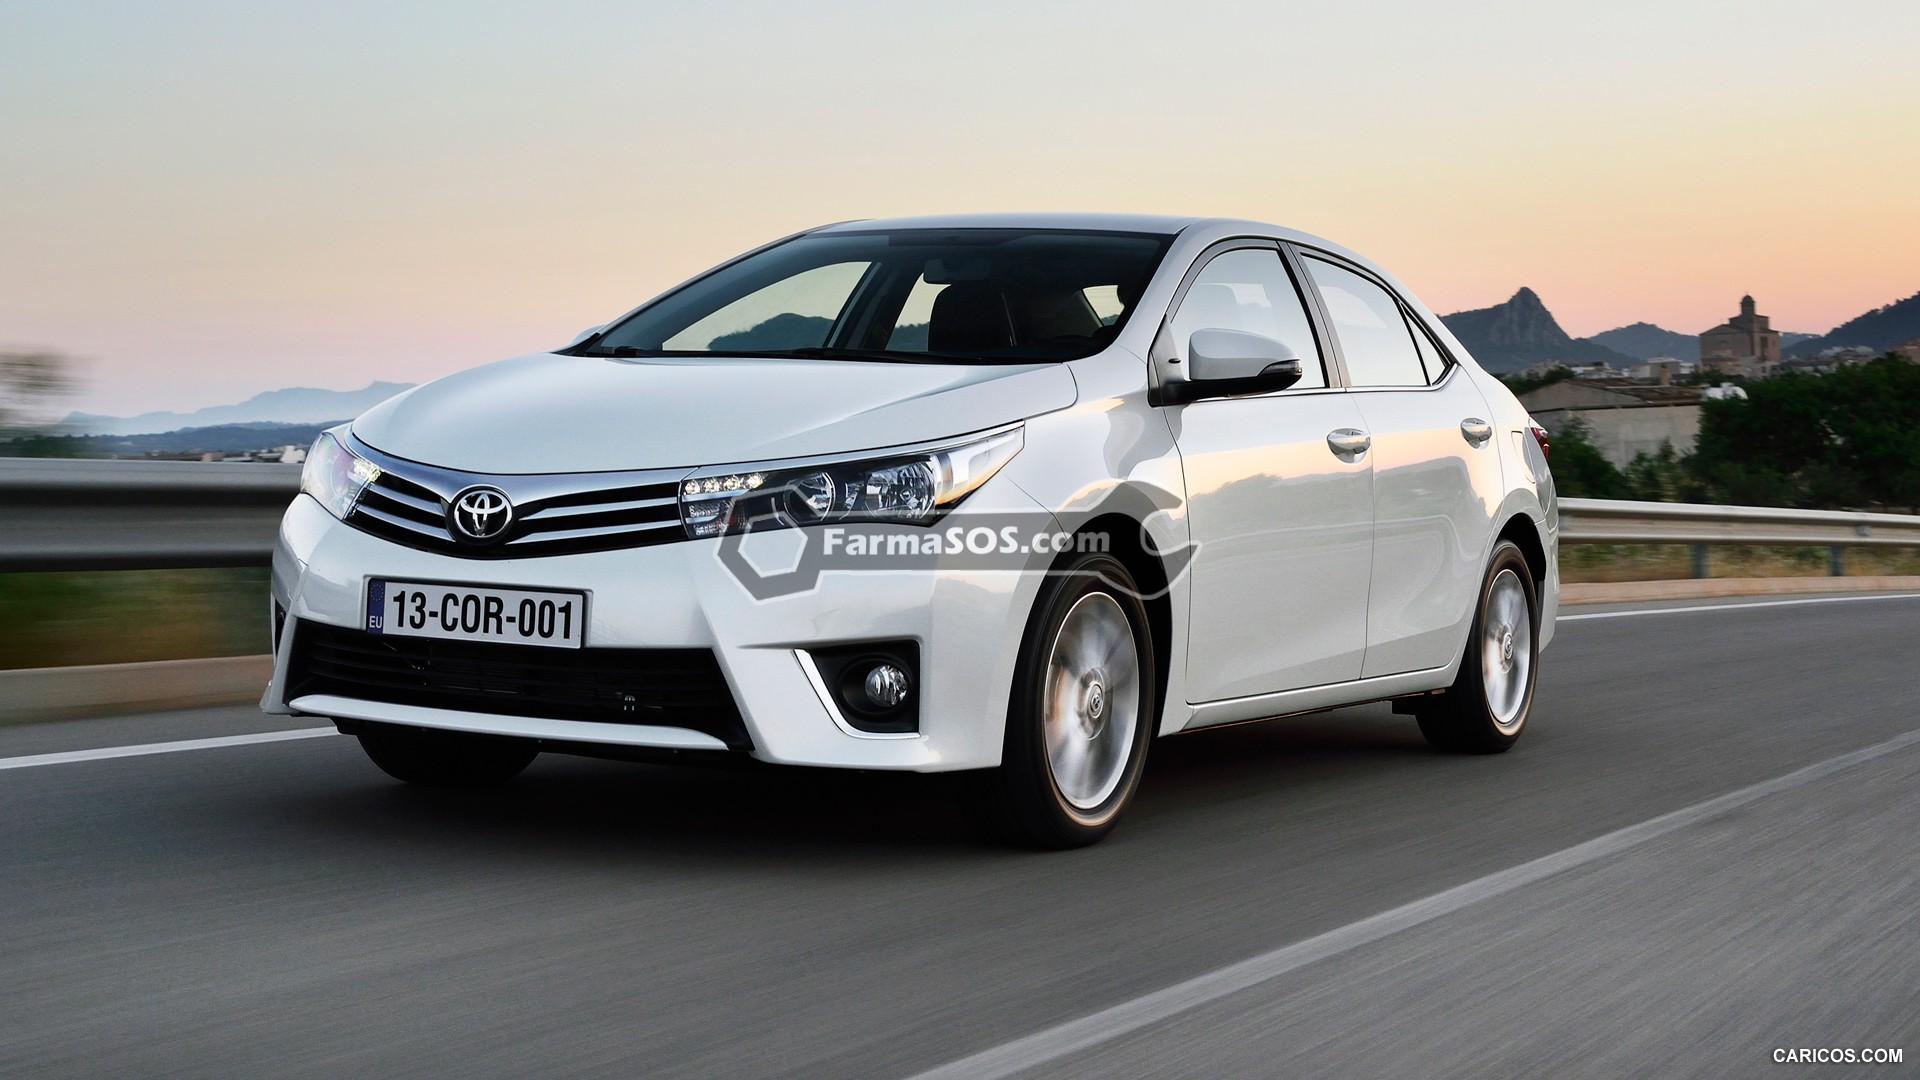 Toyota Corolla 2014 2015 2 باتری تویوتا کرولا